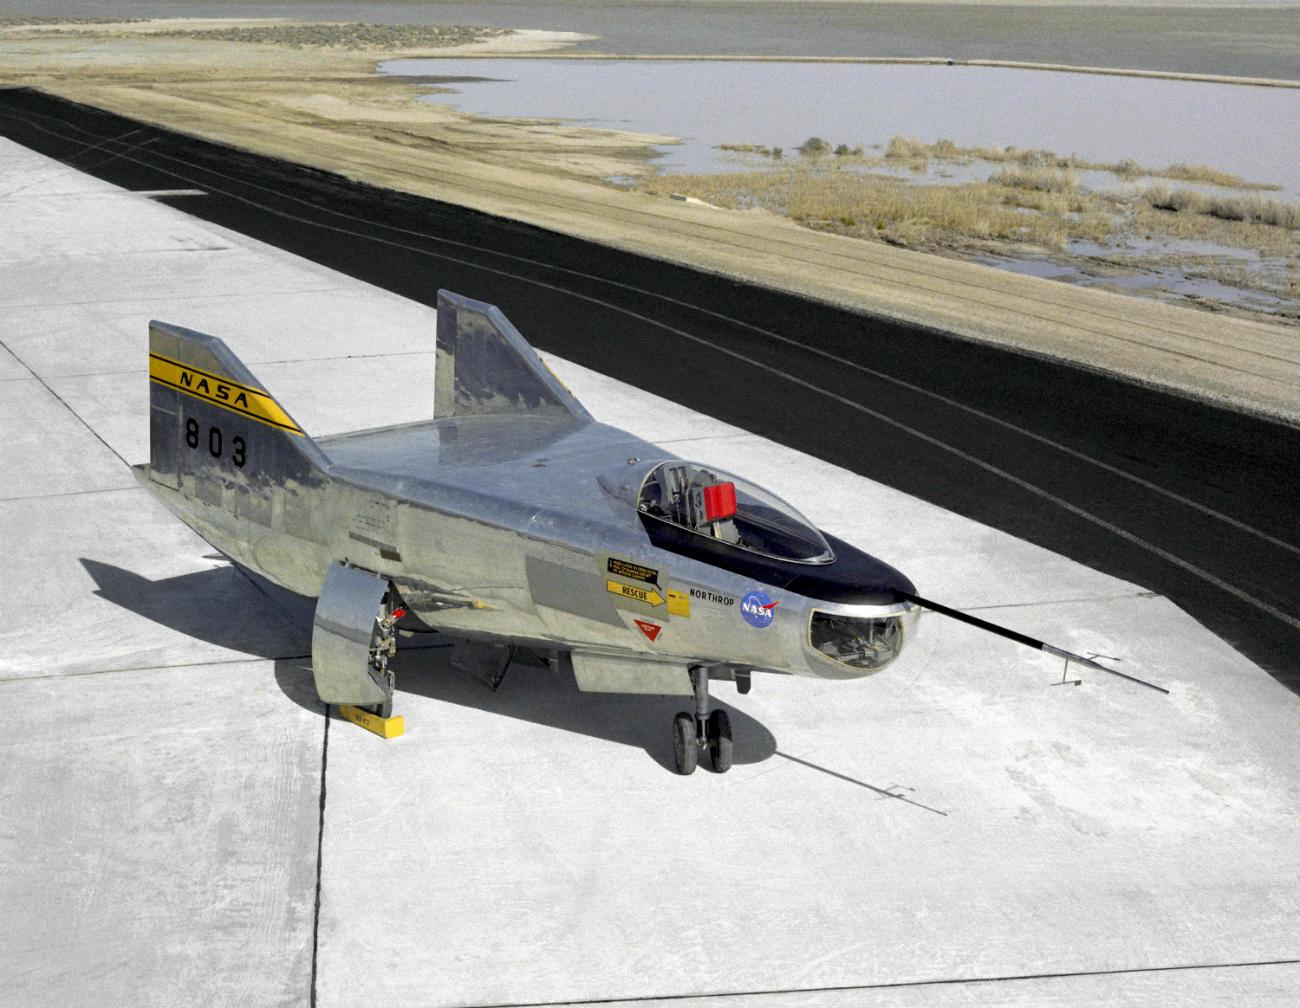 M2-F2 Lifting Body on the flight path